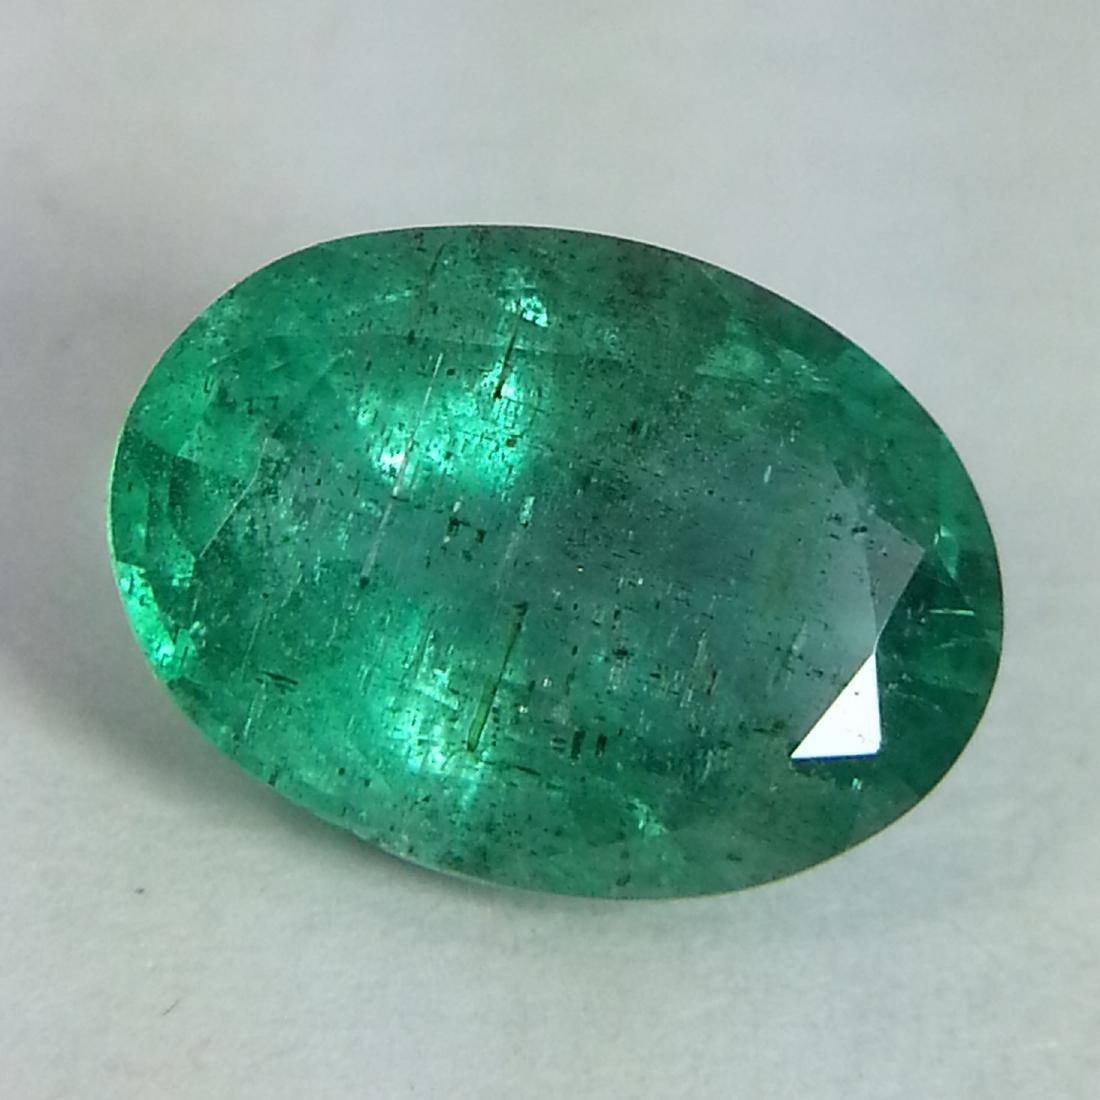 Emerald - 2.16 ct